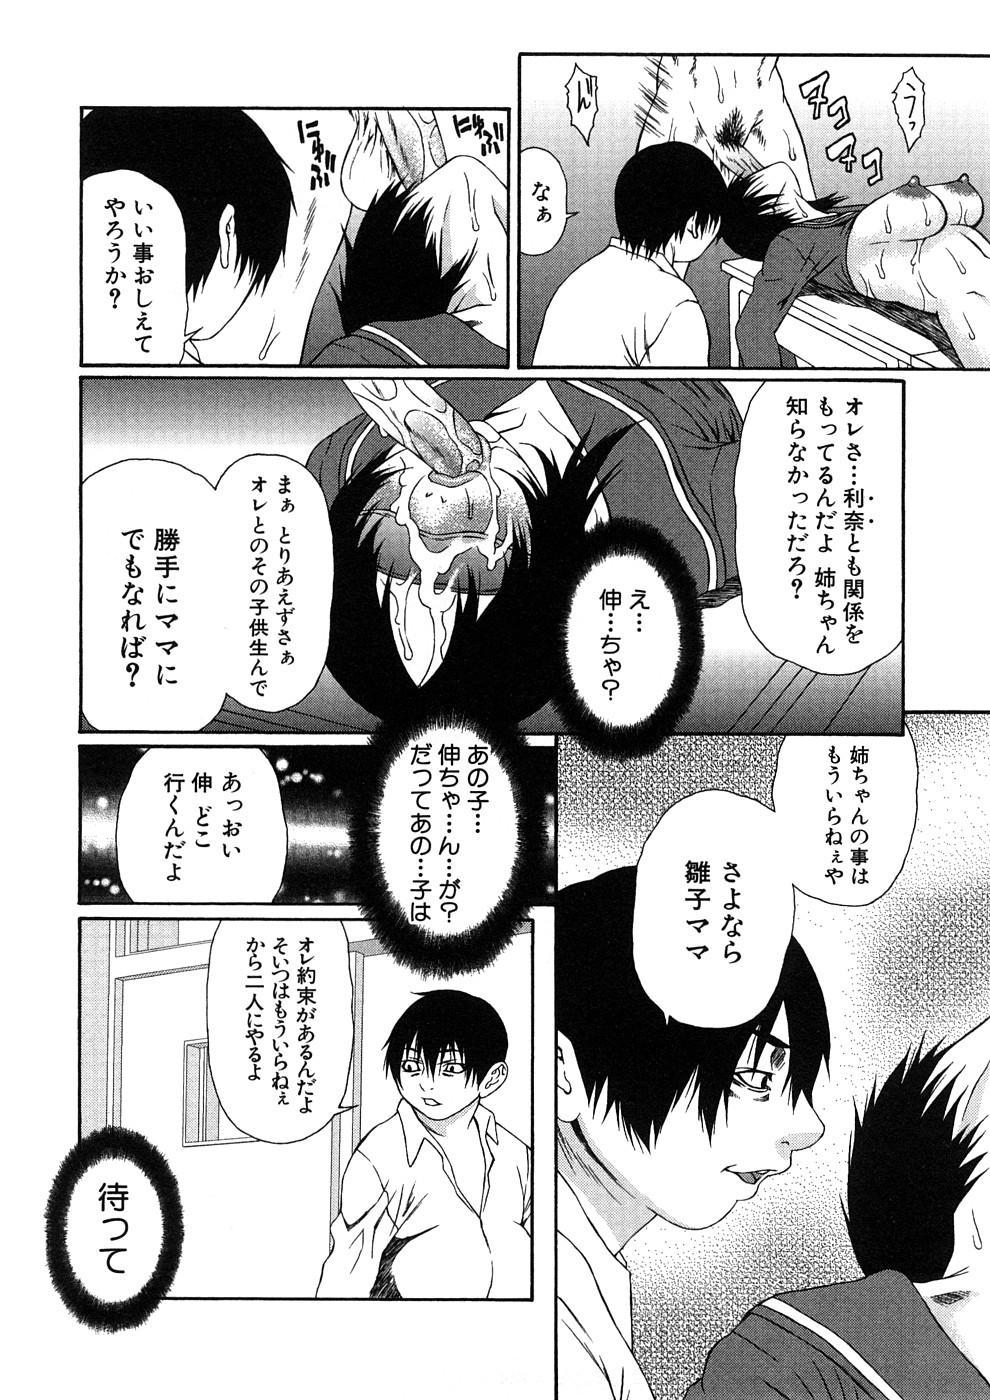 Geki Yaba Anthology Vol. 1 - Naka ni Dashite yo 196